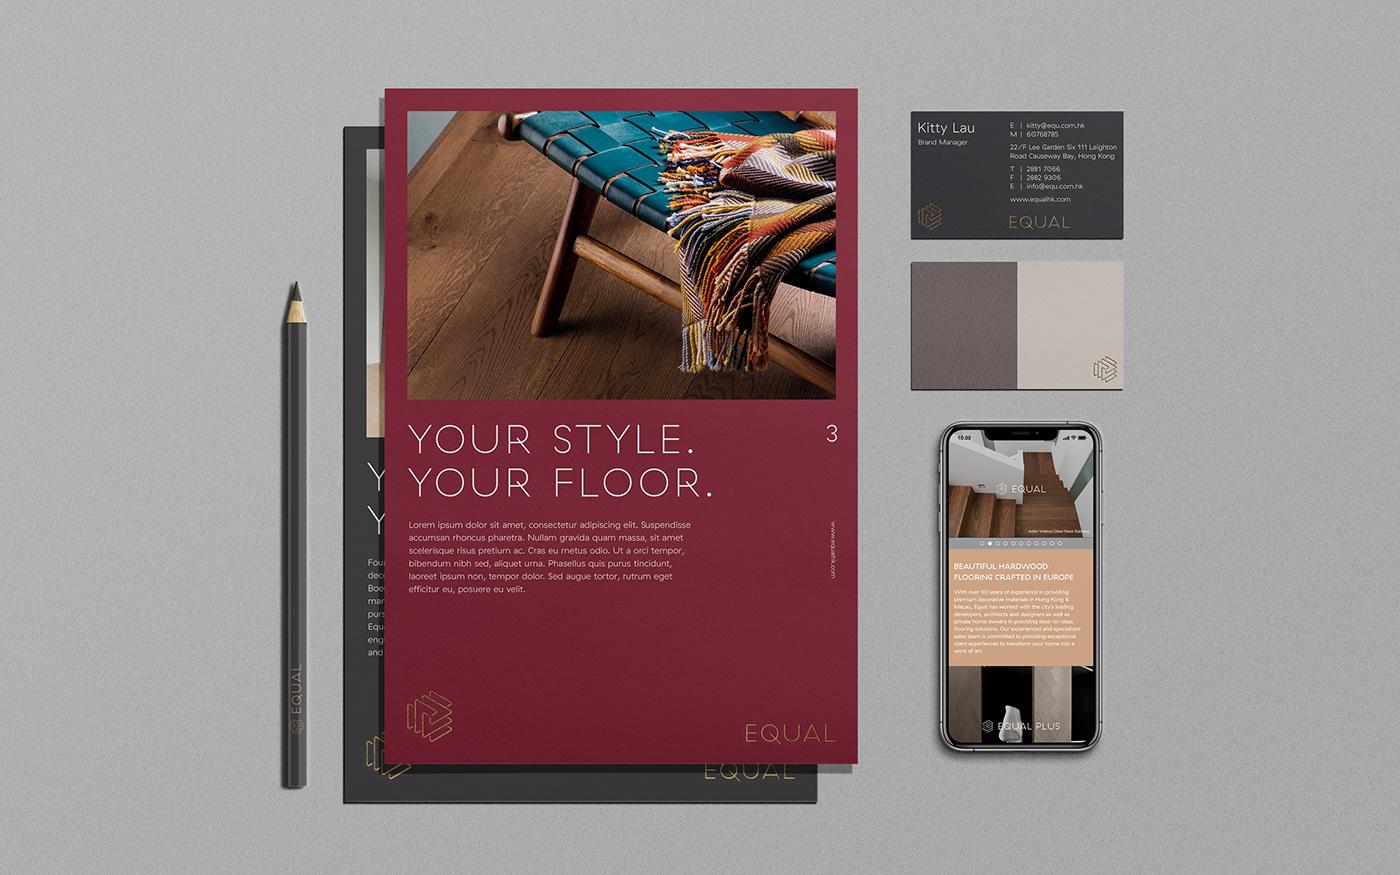 Image may contain: book, screenshot and poster